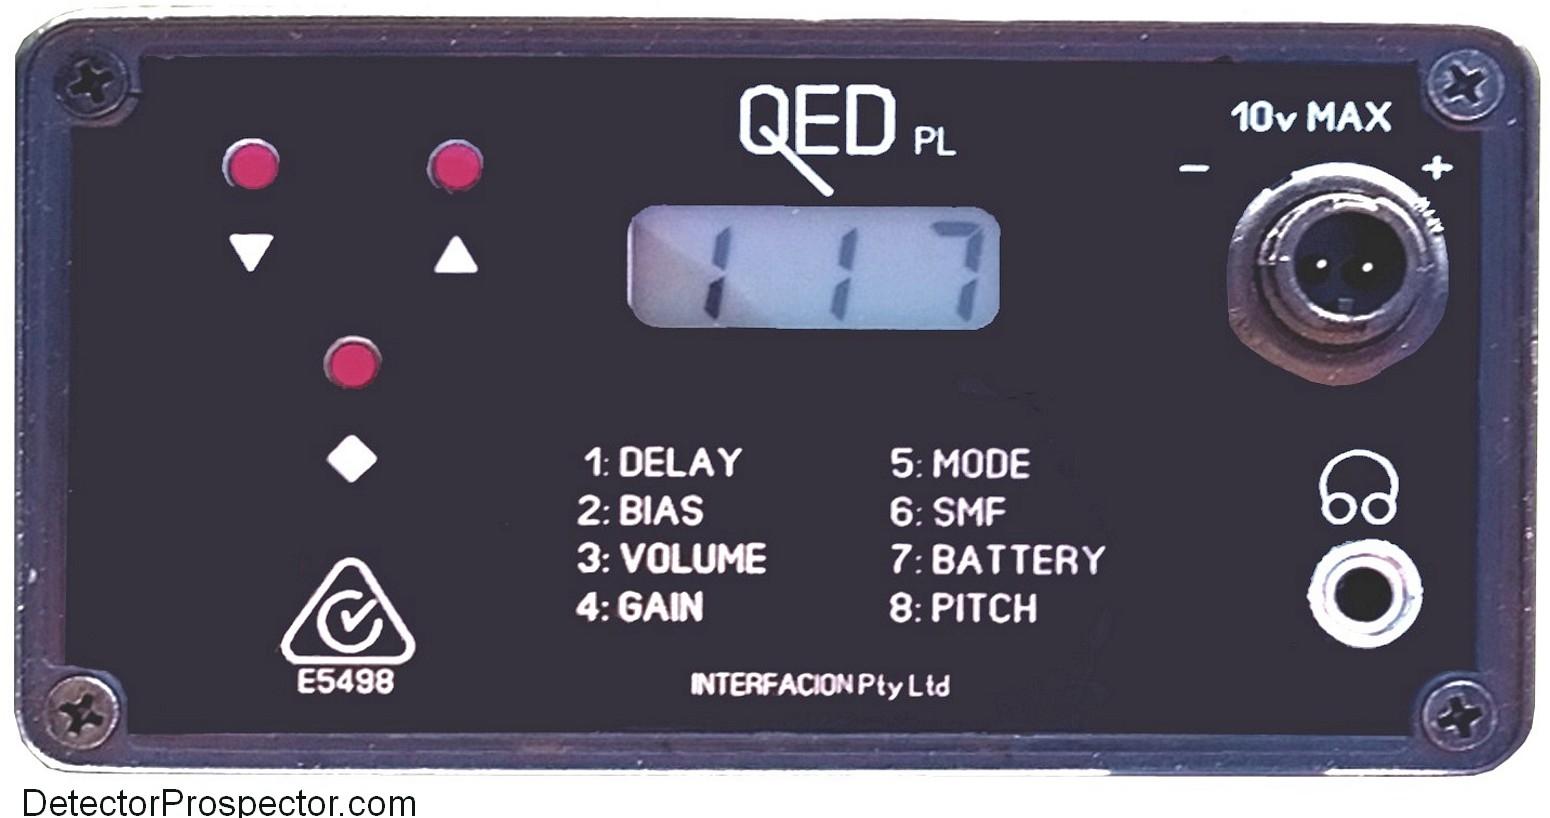 qed-gold-prospecting-metal-detector-controls.jpg